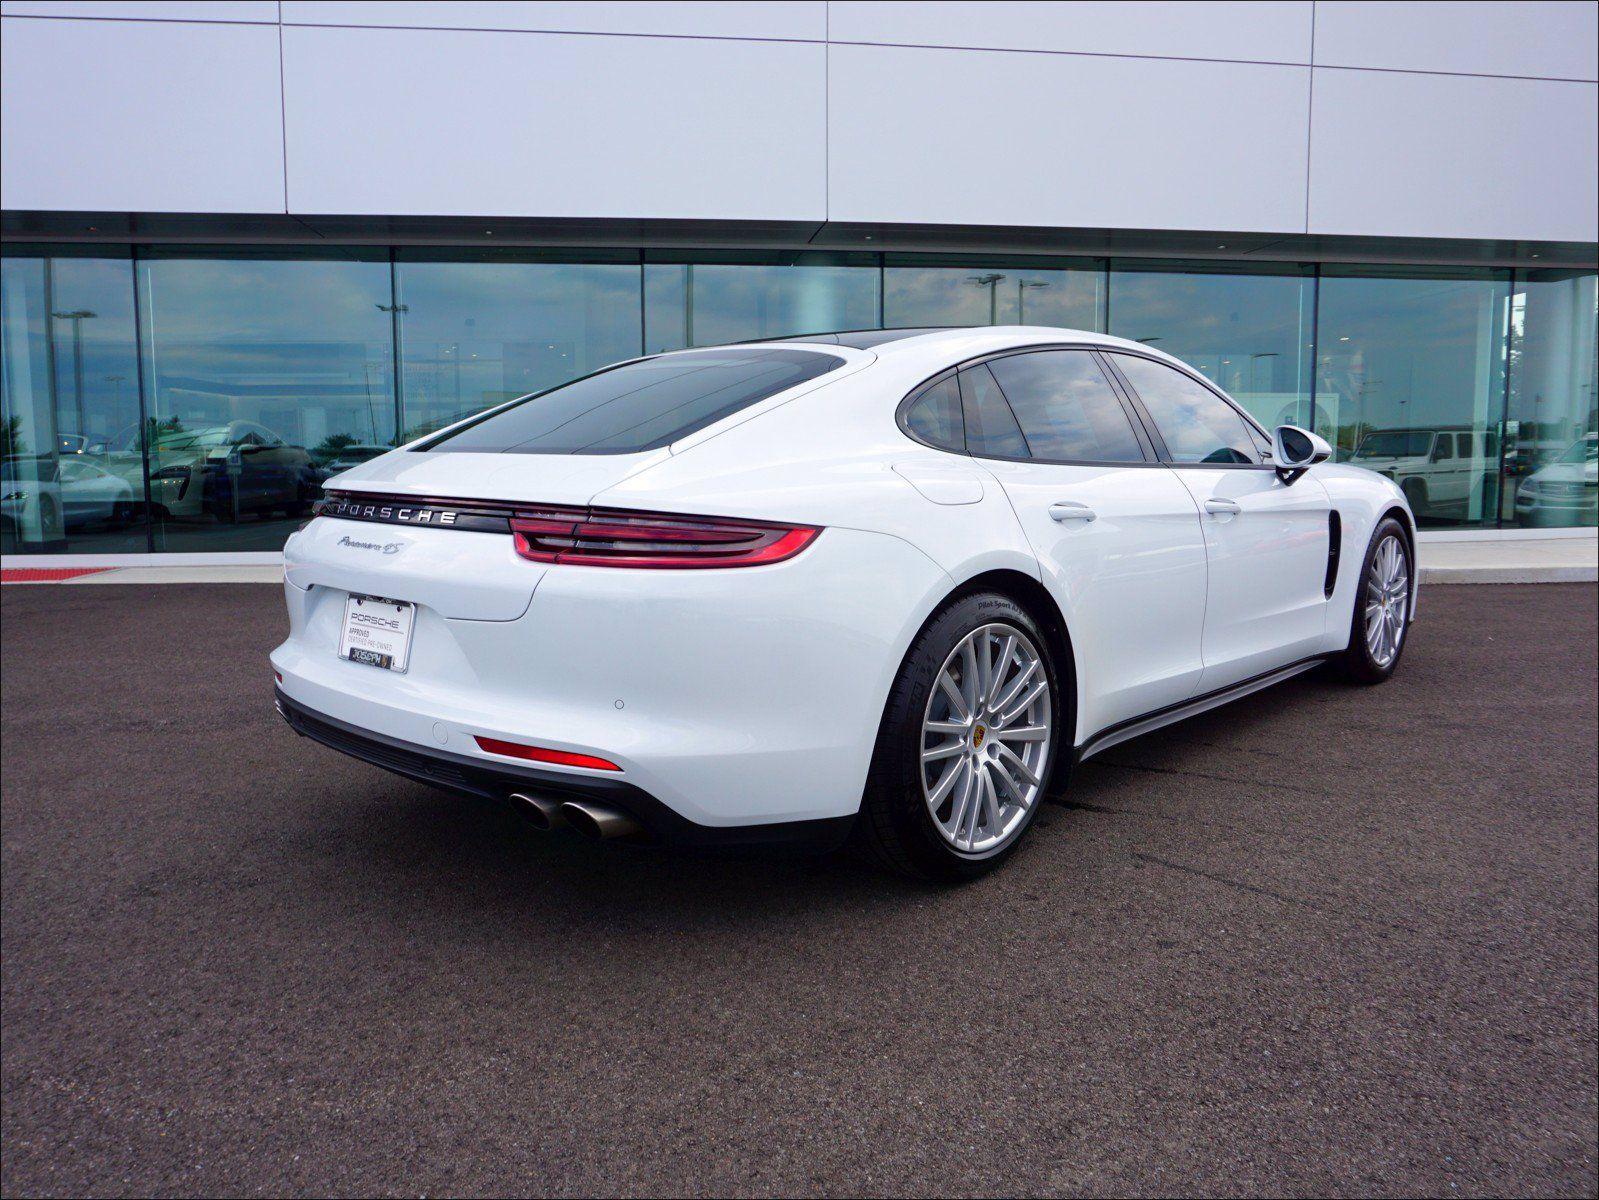 2018 Porsche Panamera 4S – 3